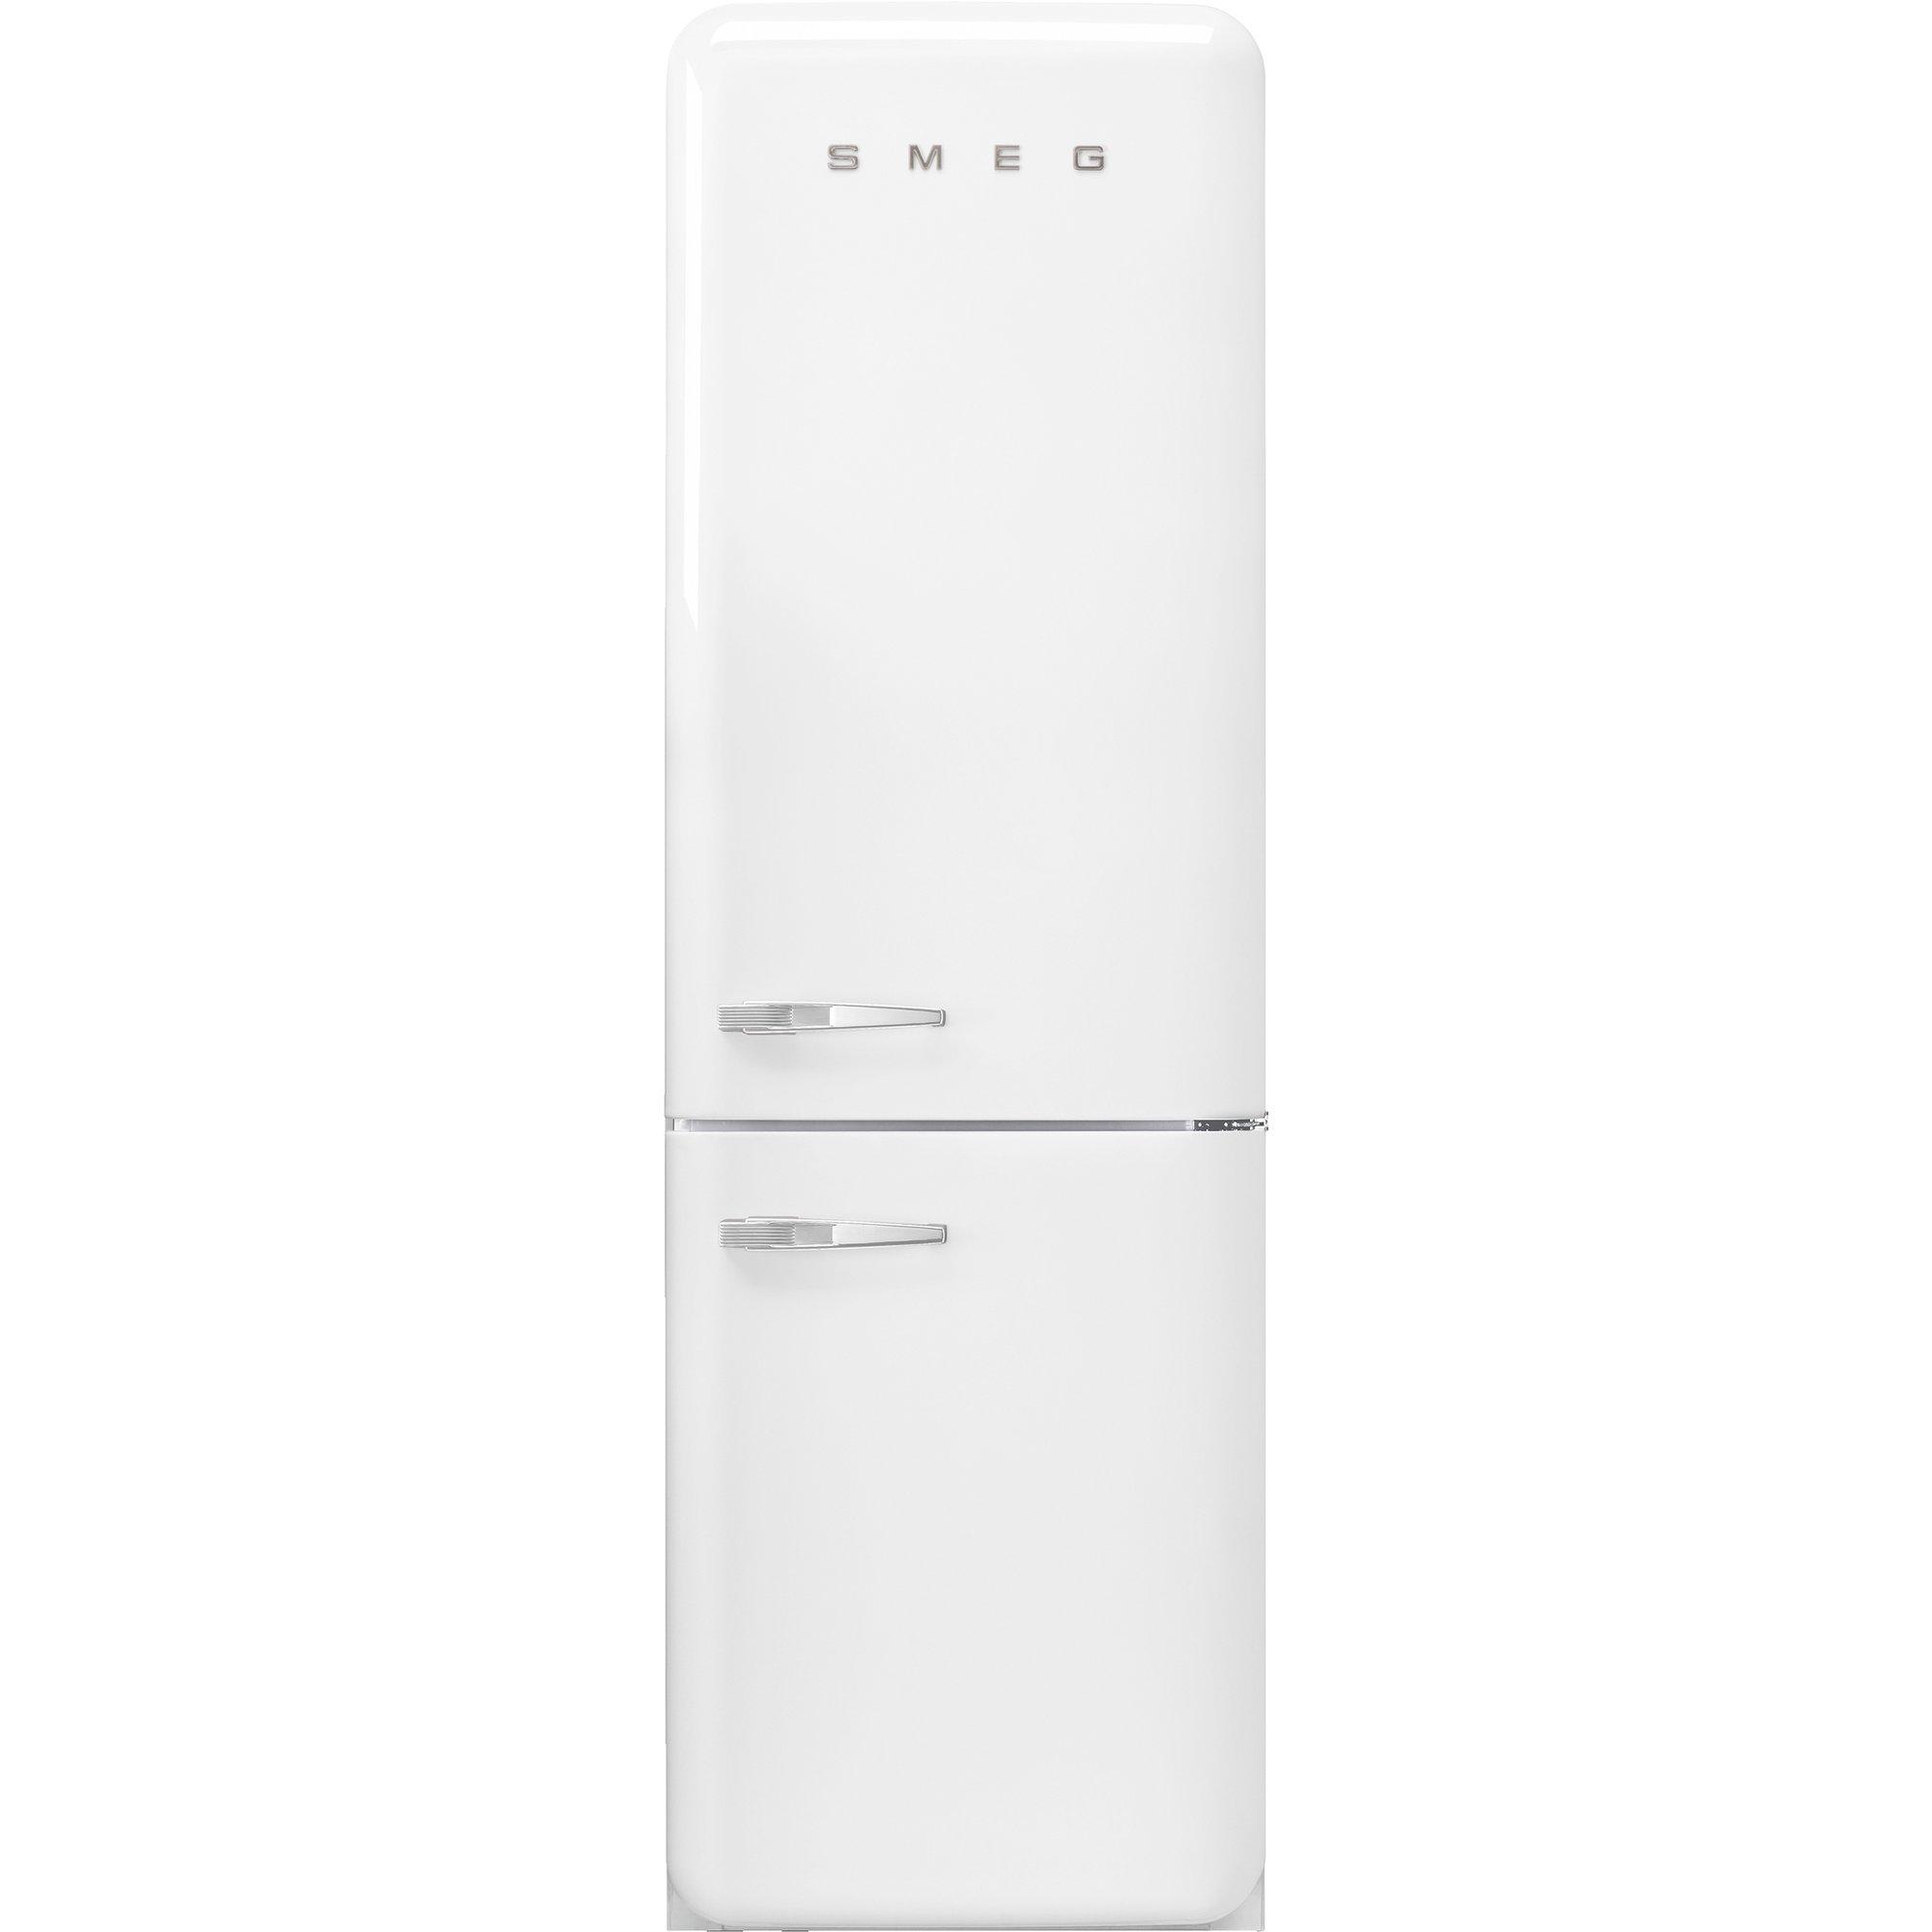 Smeg Kylskåp/frys i 50-tals retrostil högerhängt vit